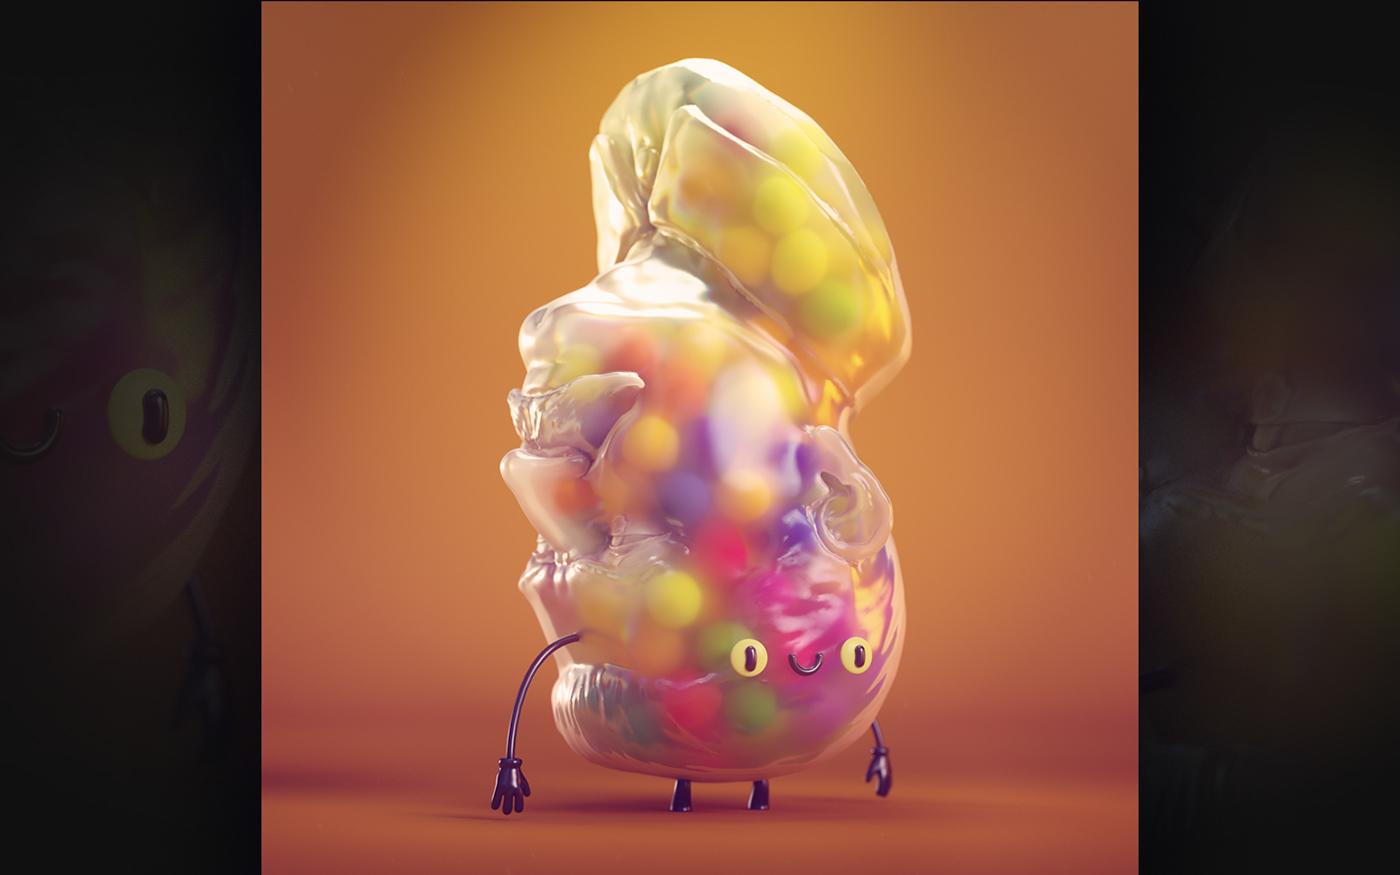 Les créations en 3D de Zigor Samaniego